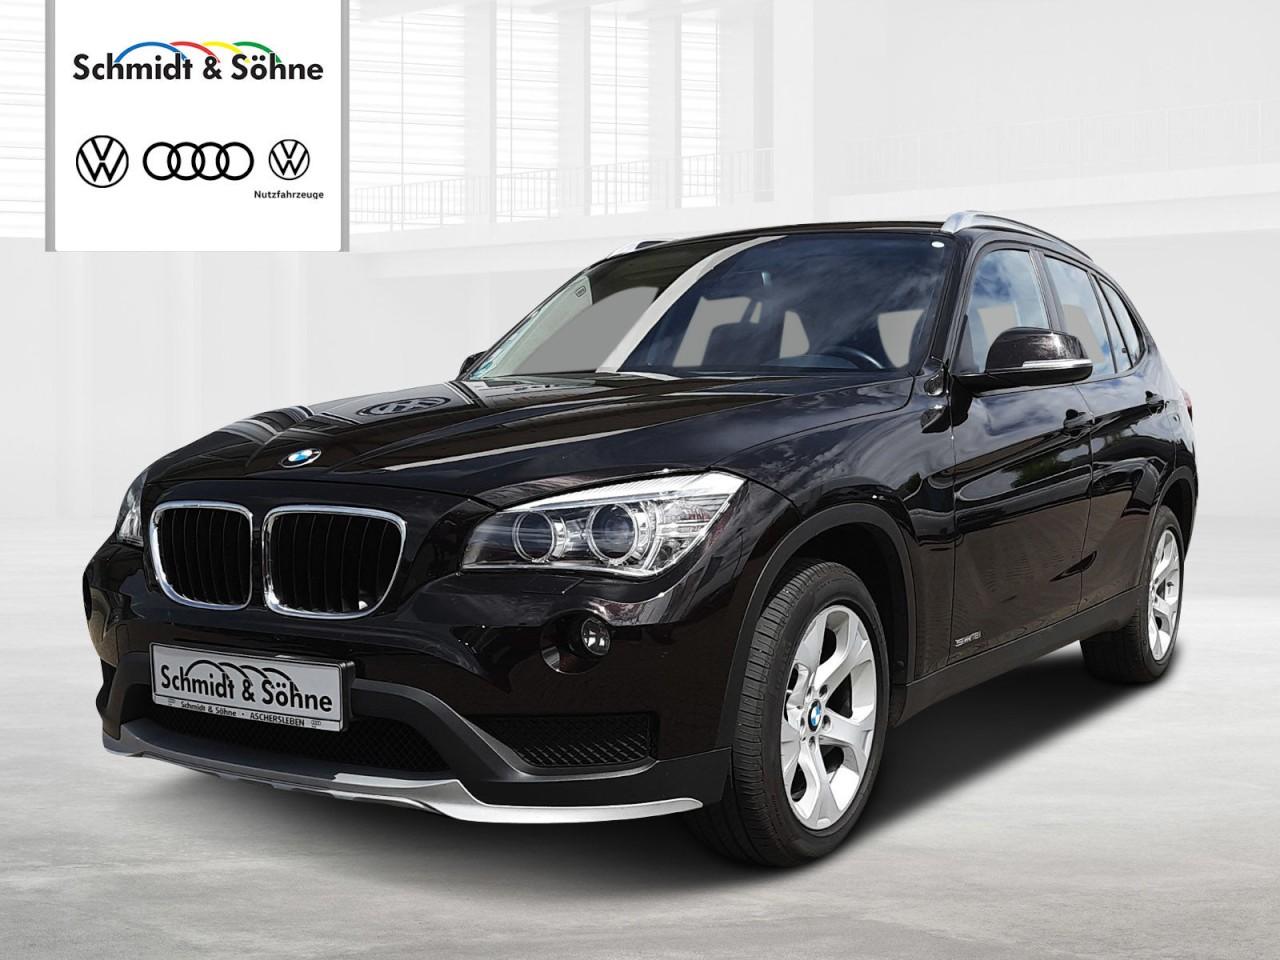 BMW X1 18i sDrive XENON, EPH, SHZ, KL-AUT, NSW, MAL, Jahr 2014, Benzin